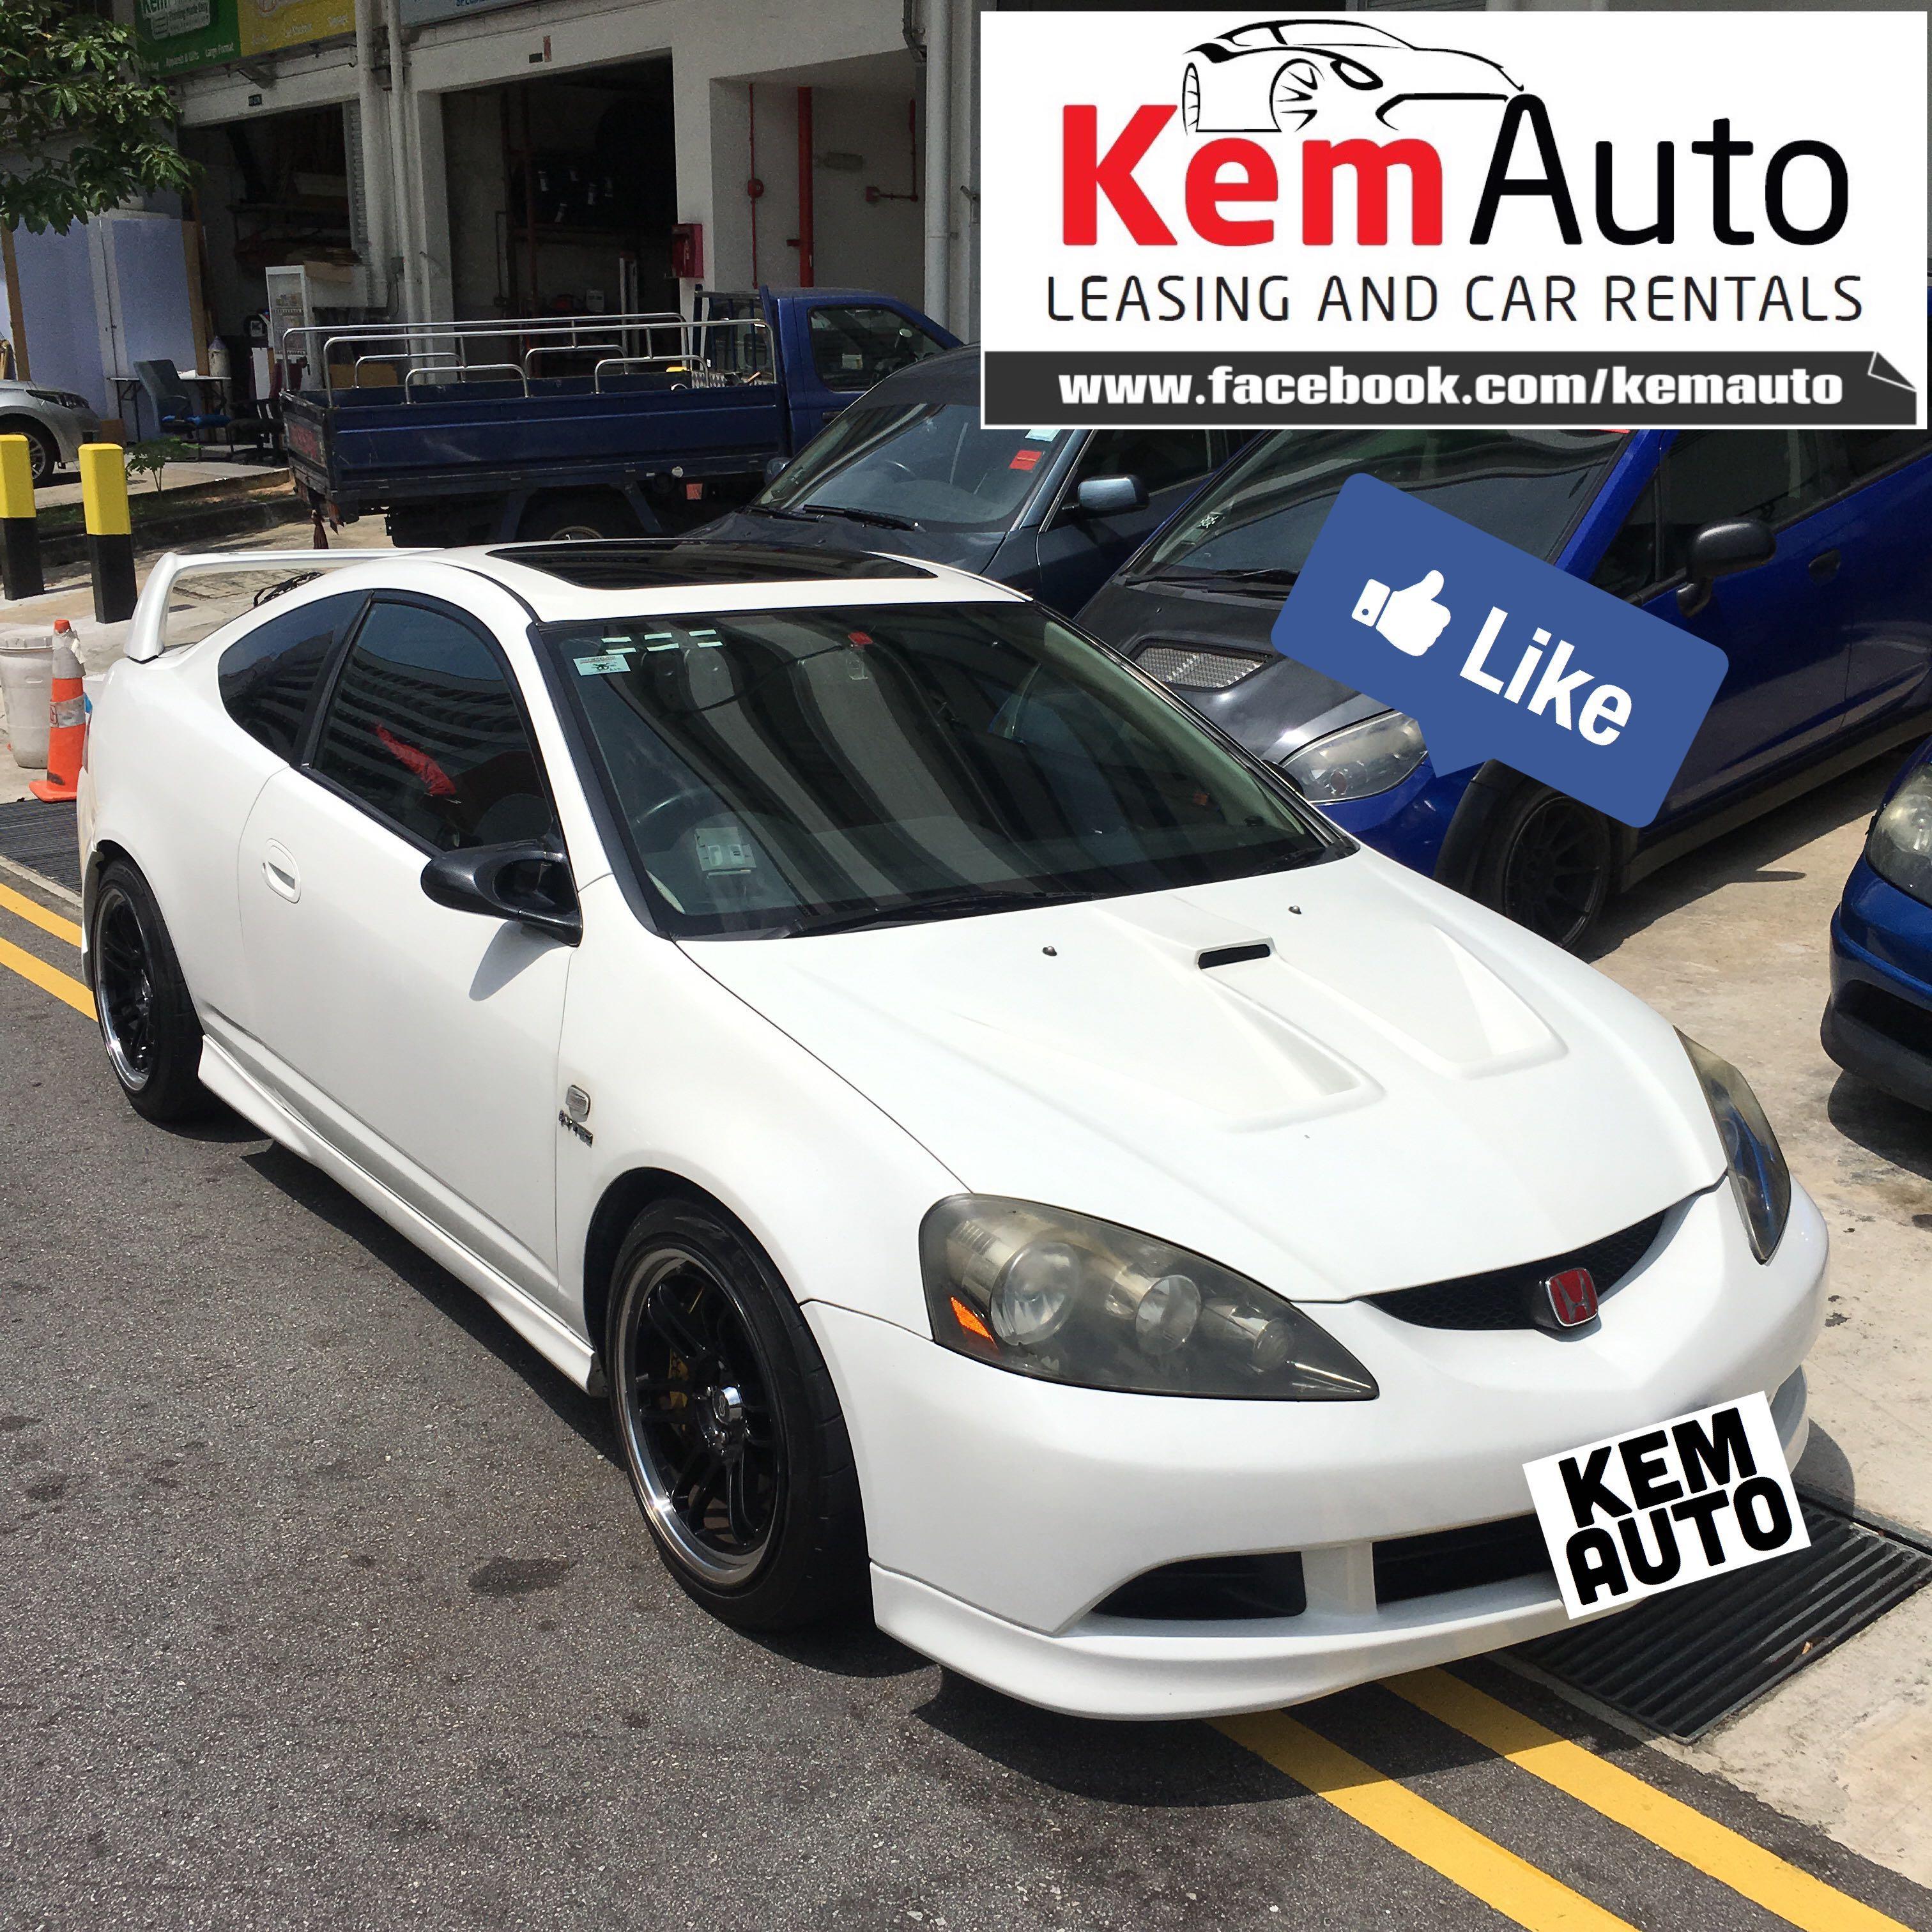 Hari Raya cheap weekend car rental COVID Low price